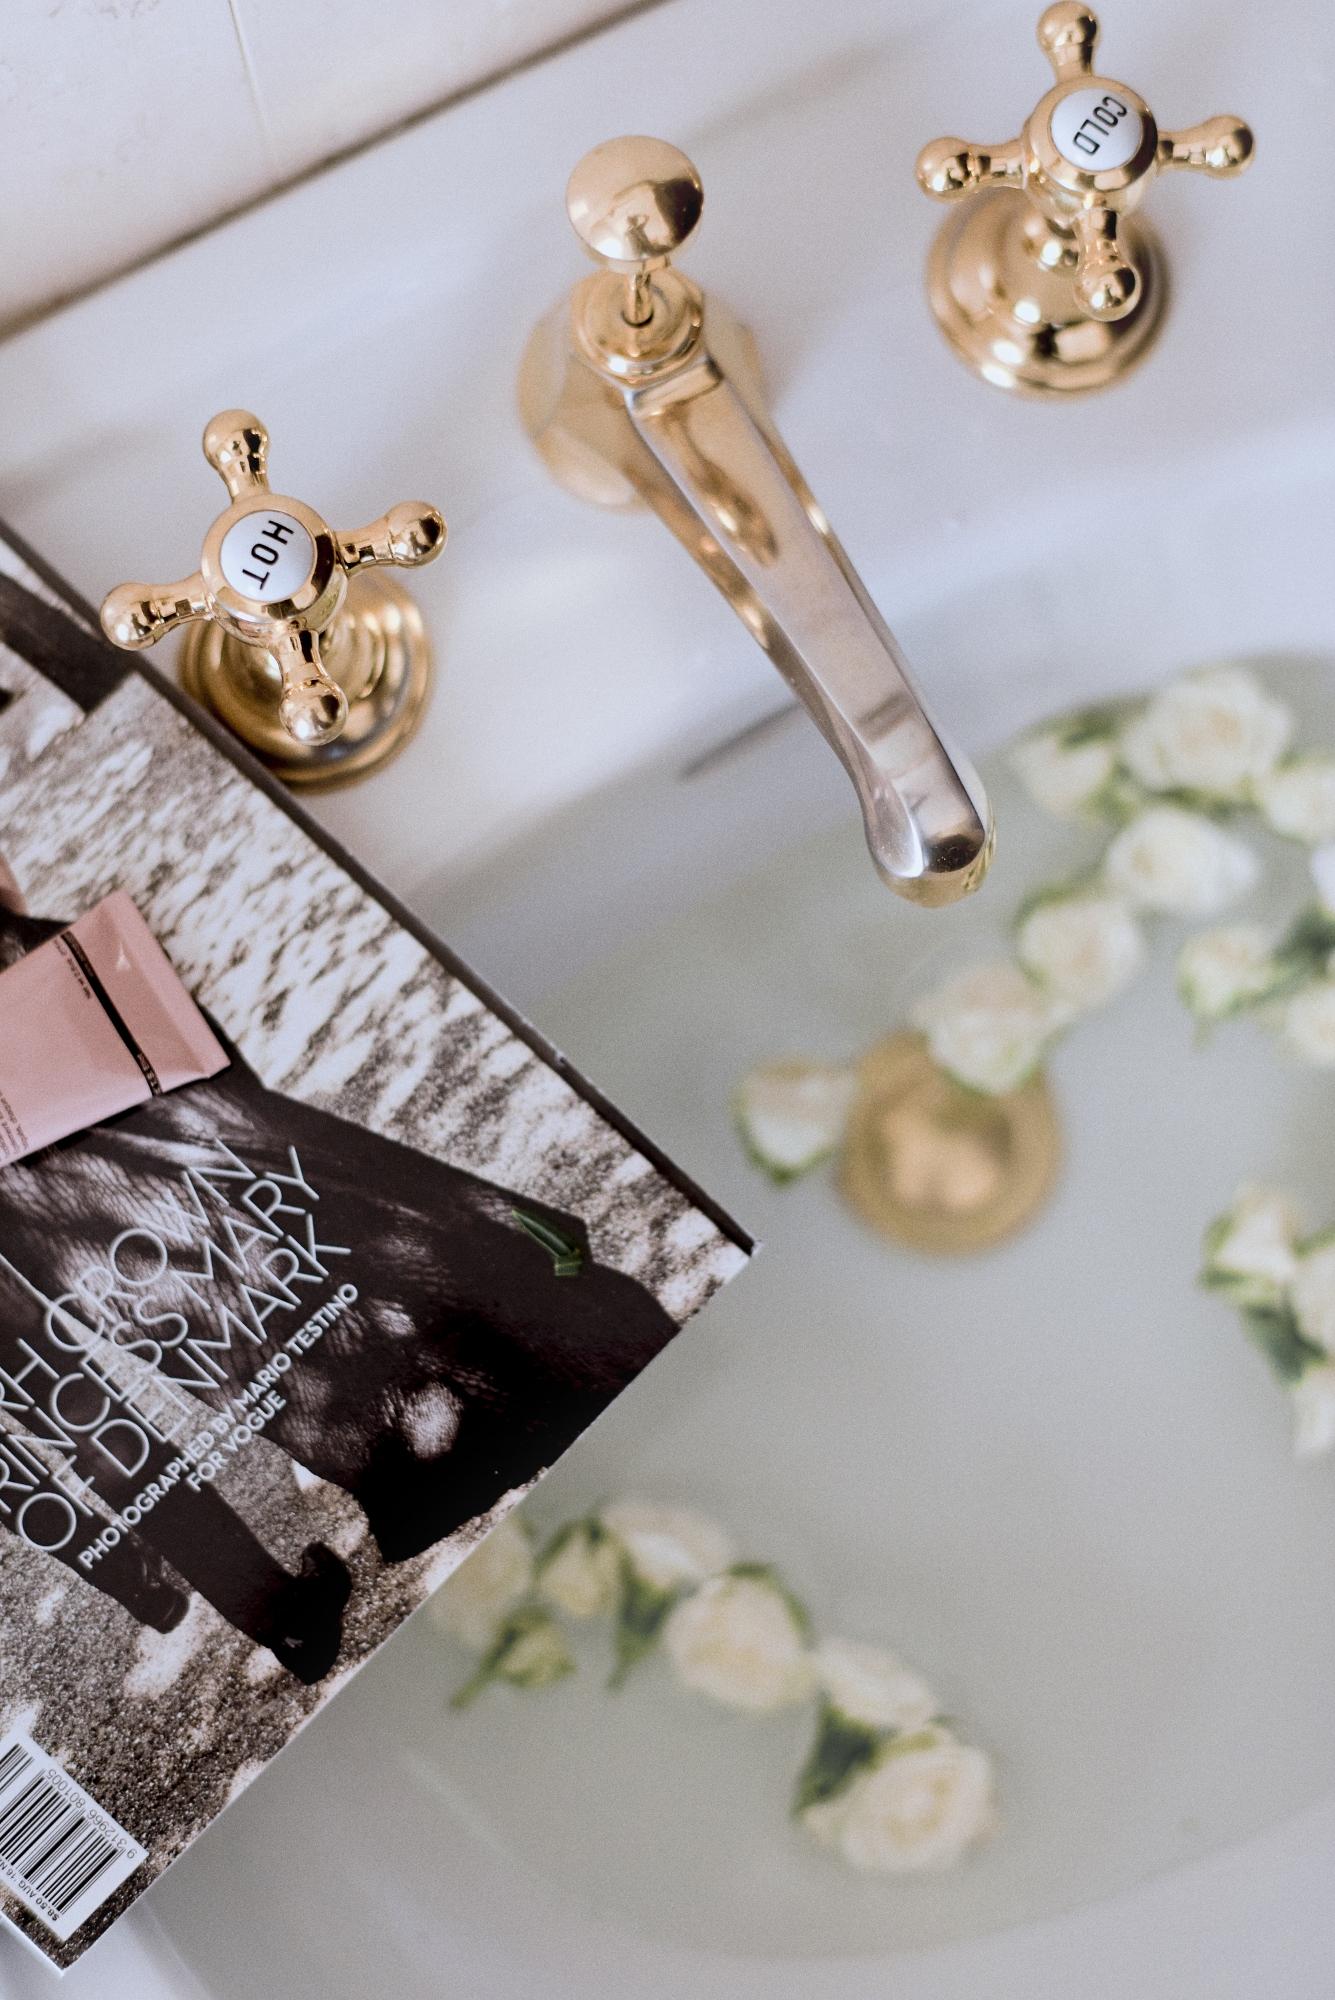 Sephory Photography-Her Morning Elegance Print 015 (1335x2000)